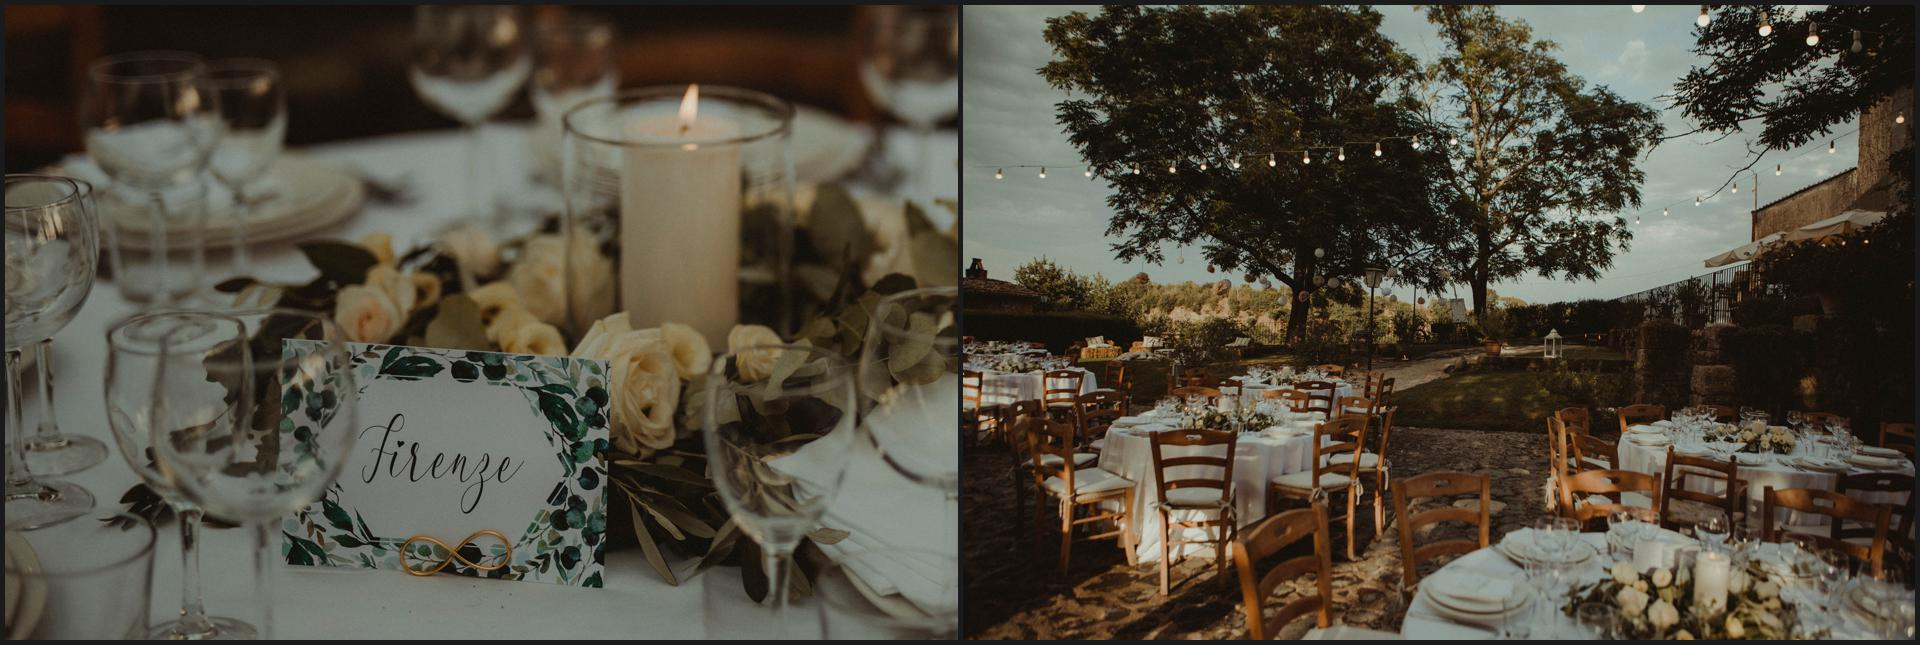 borgo di tragliata, wedding, rome, wedding in rome, dinner table, weding detail, table setting, candles